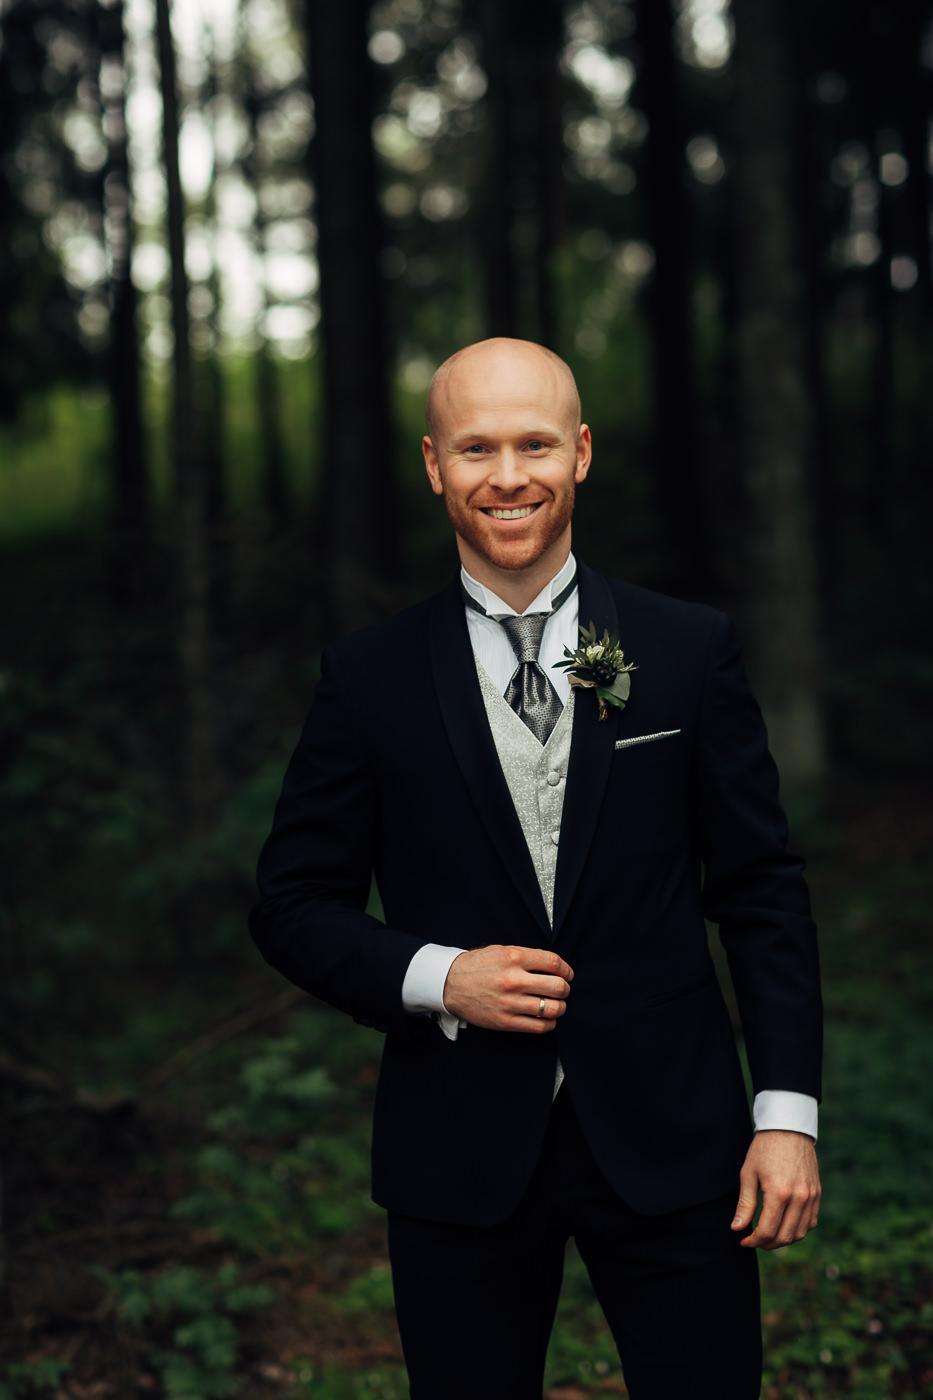 Malene & Ole Martin - elegant dansk- norskt bryllup i Oslo Bryllup Gamle Aker Oslo 36 Akershus